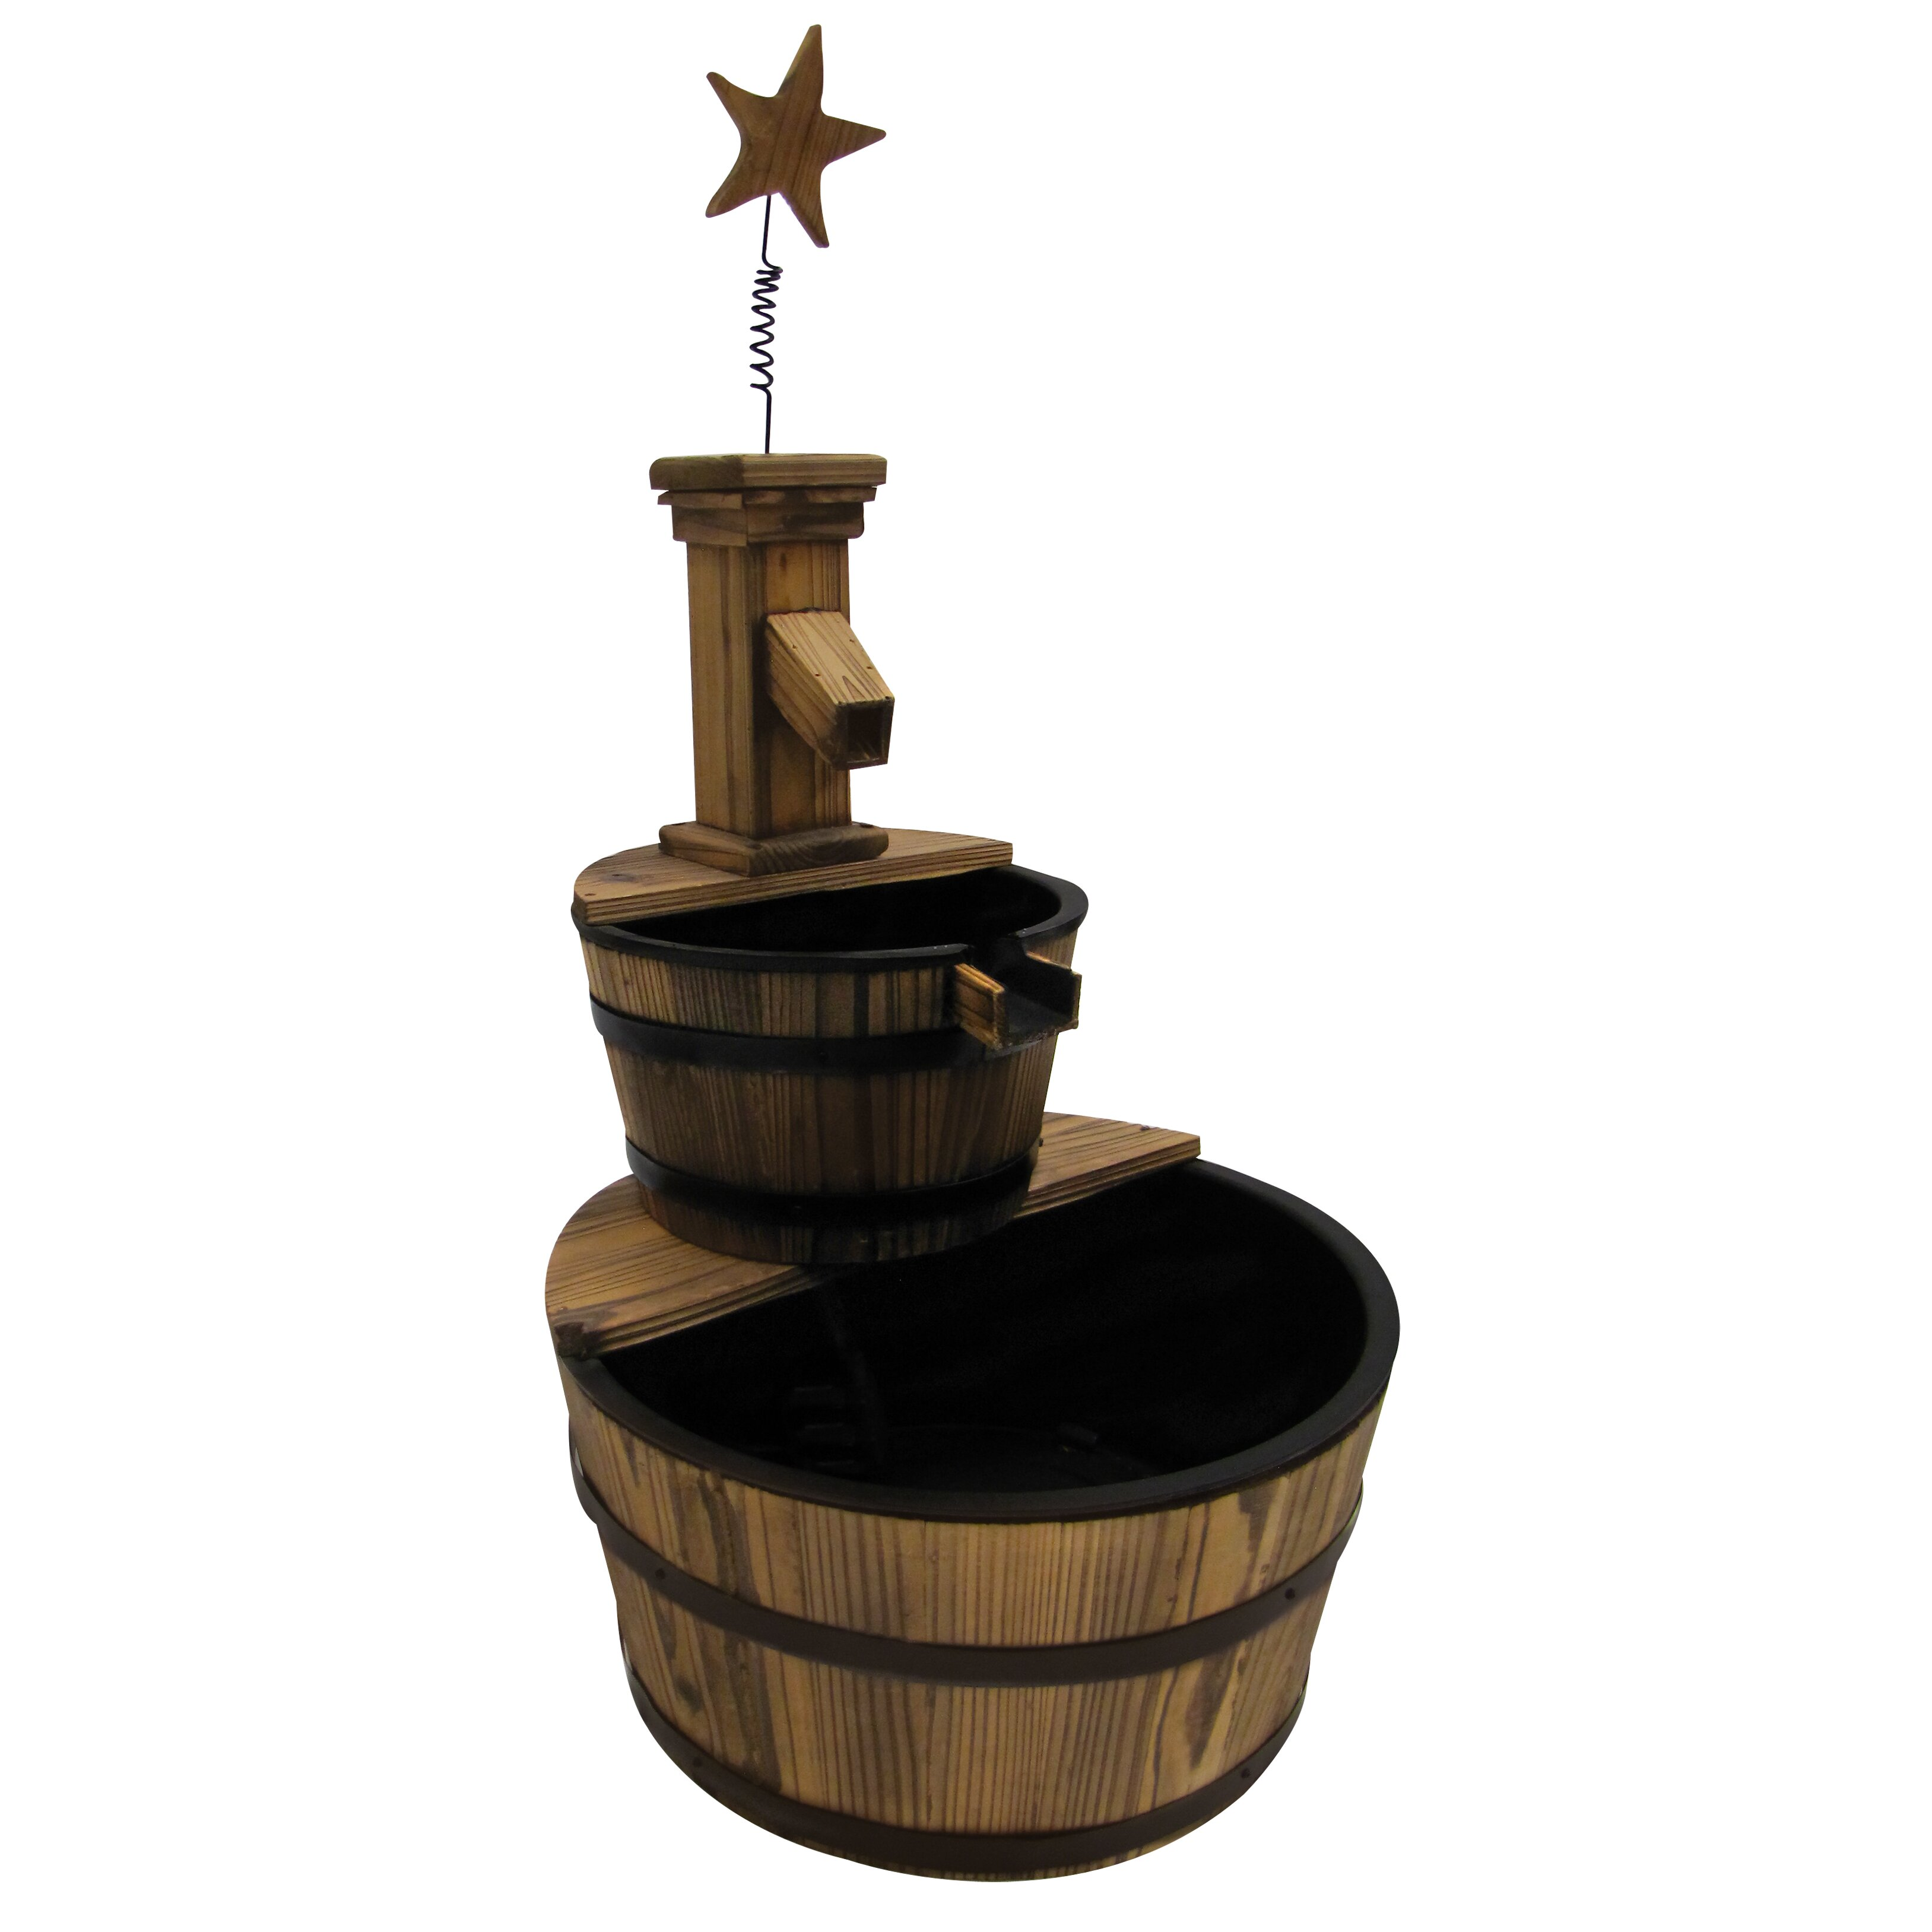 Three Stage Star Water Wood Fountain Wayfair